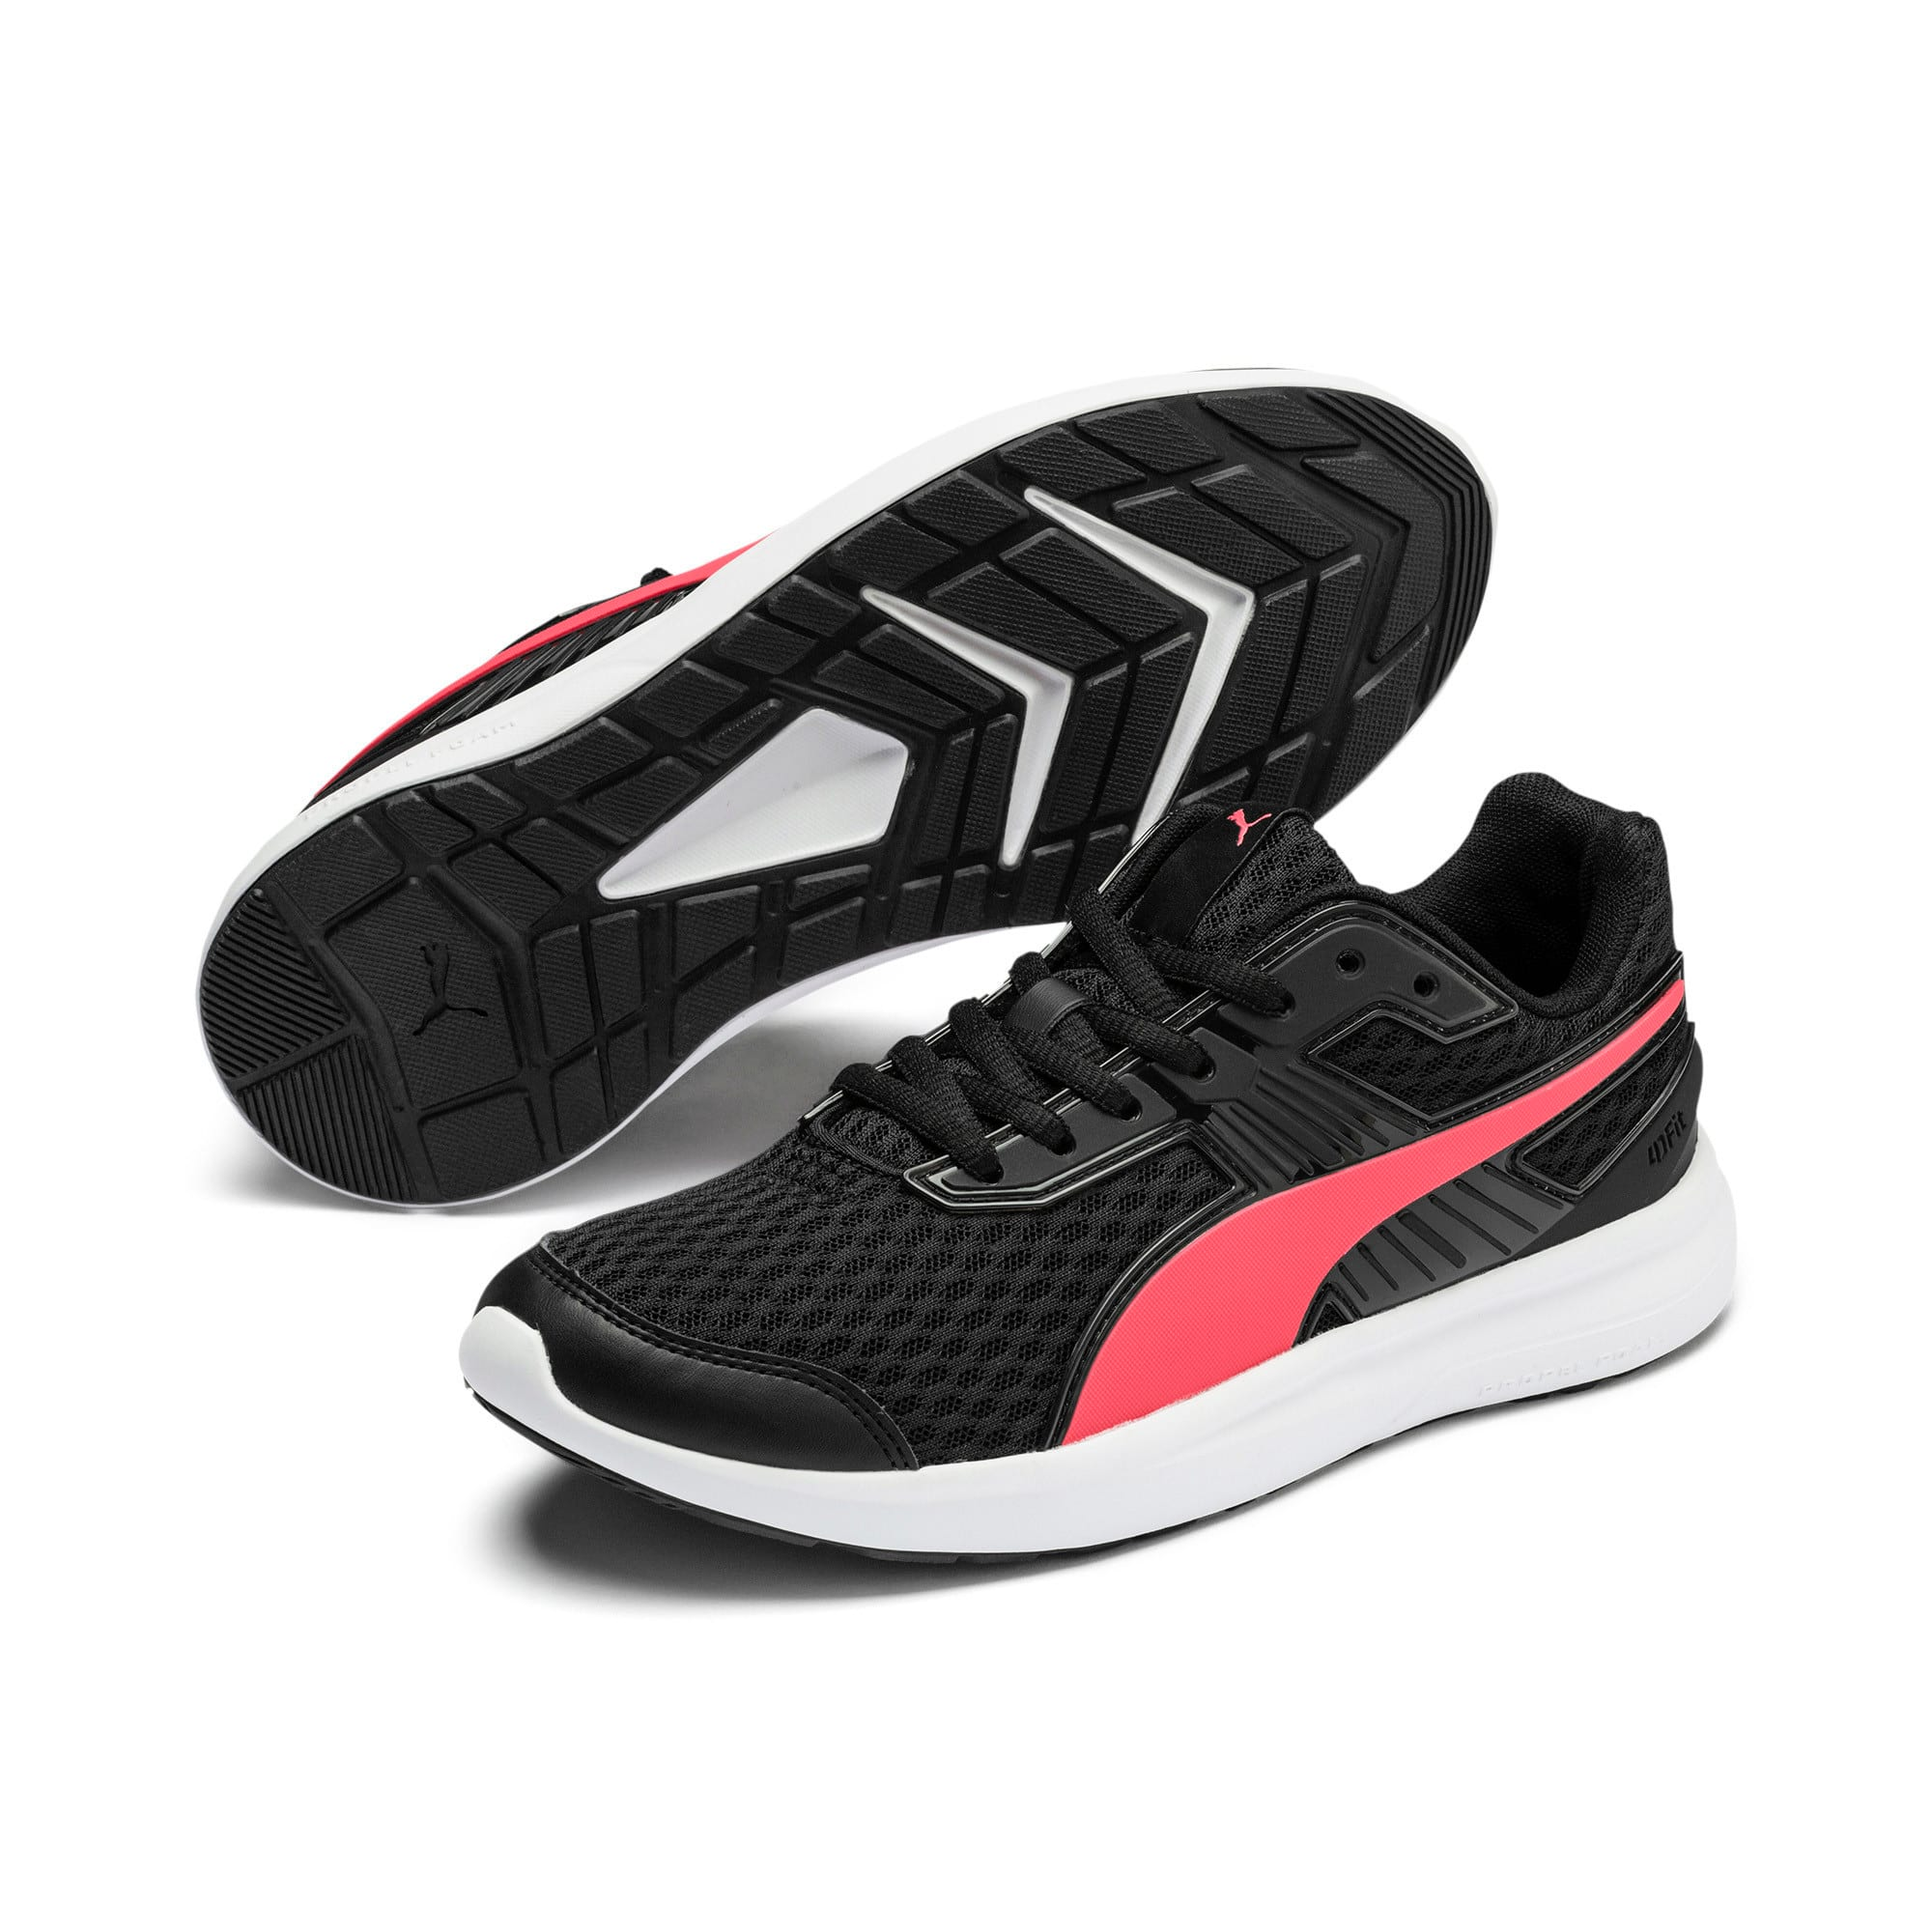 Thumbnail 8 of Escaper Pro Training Shoes, Black-Calypso Coral-White, medium-IND